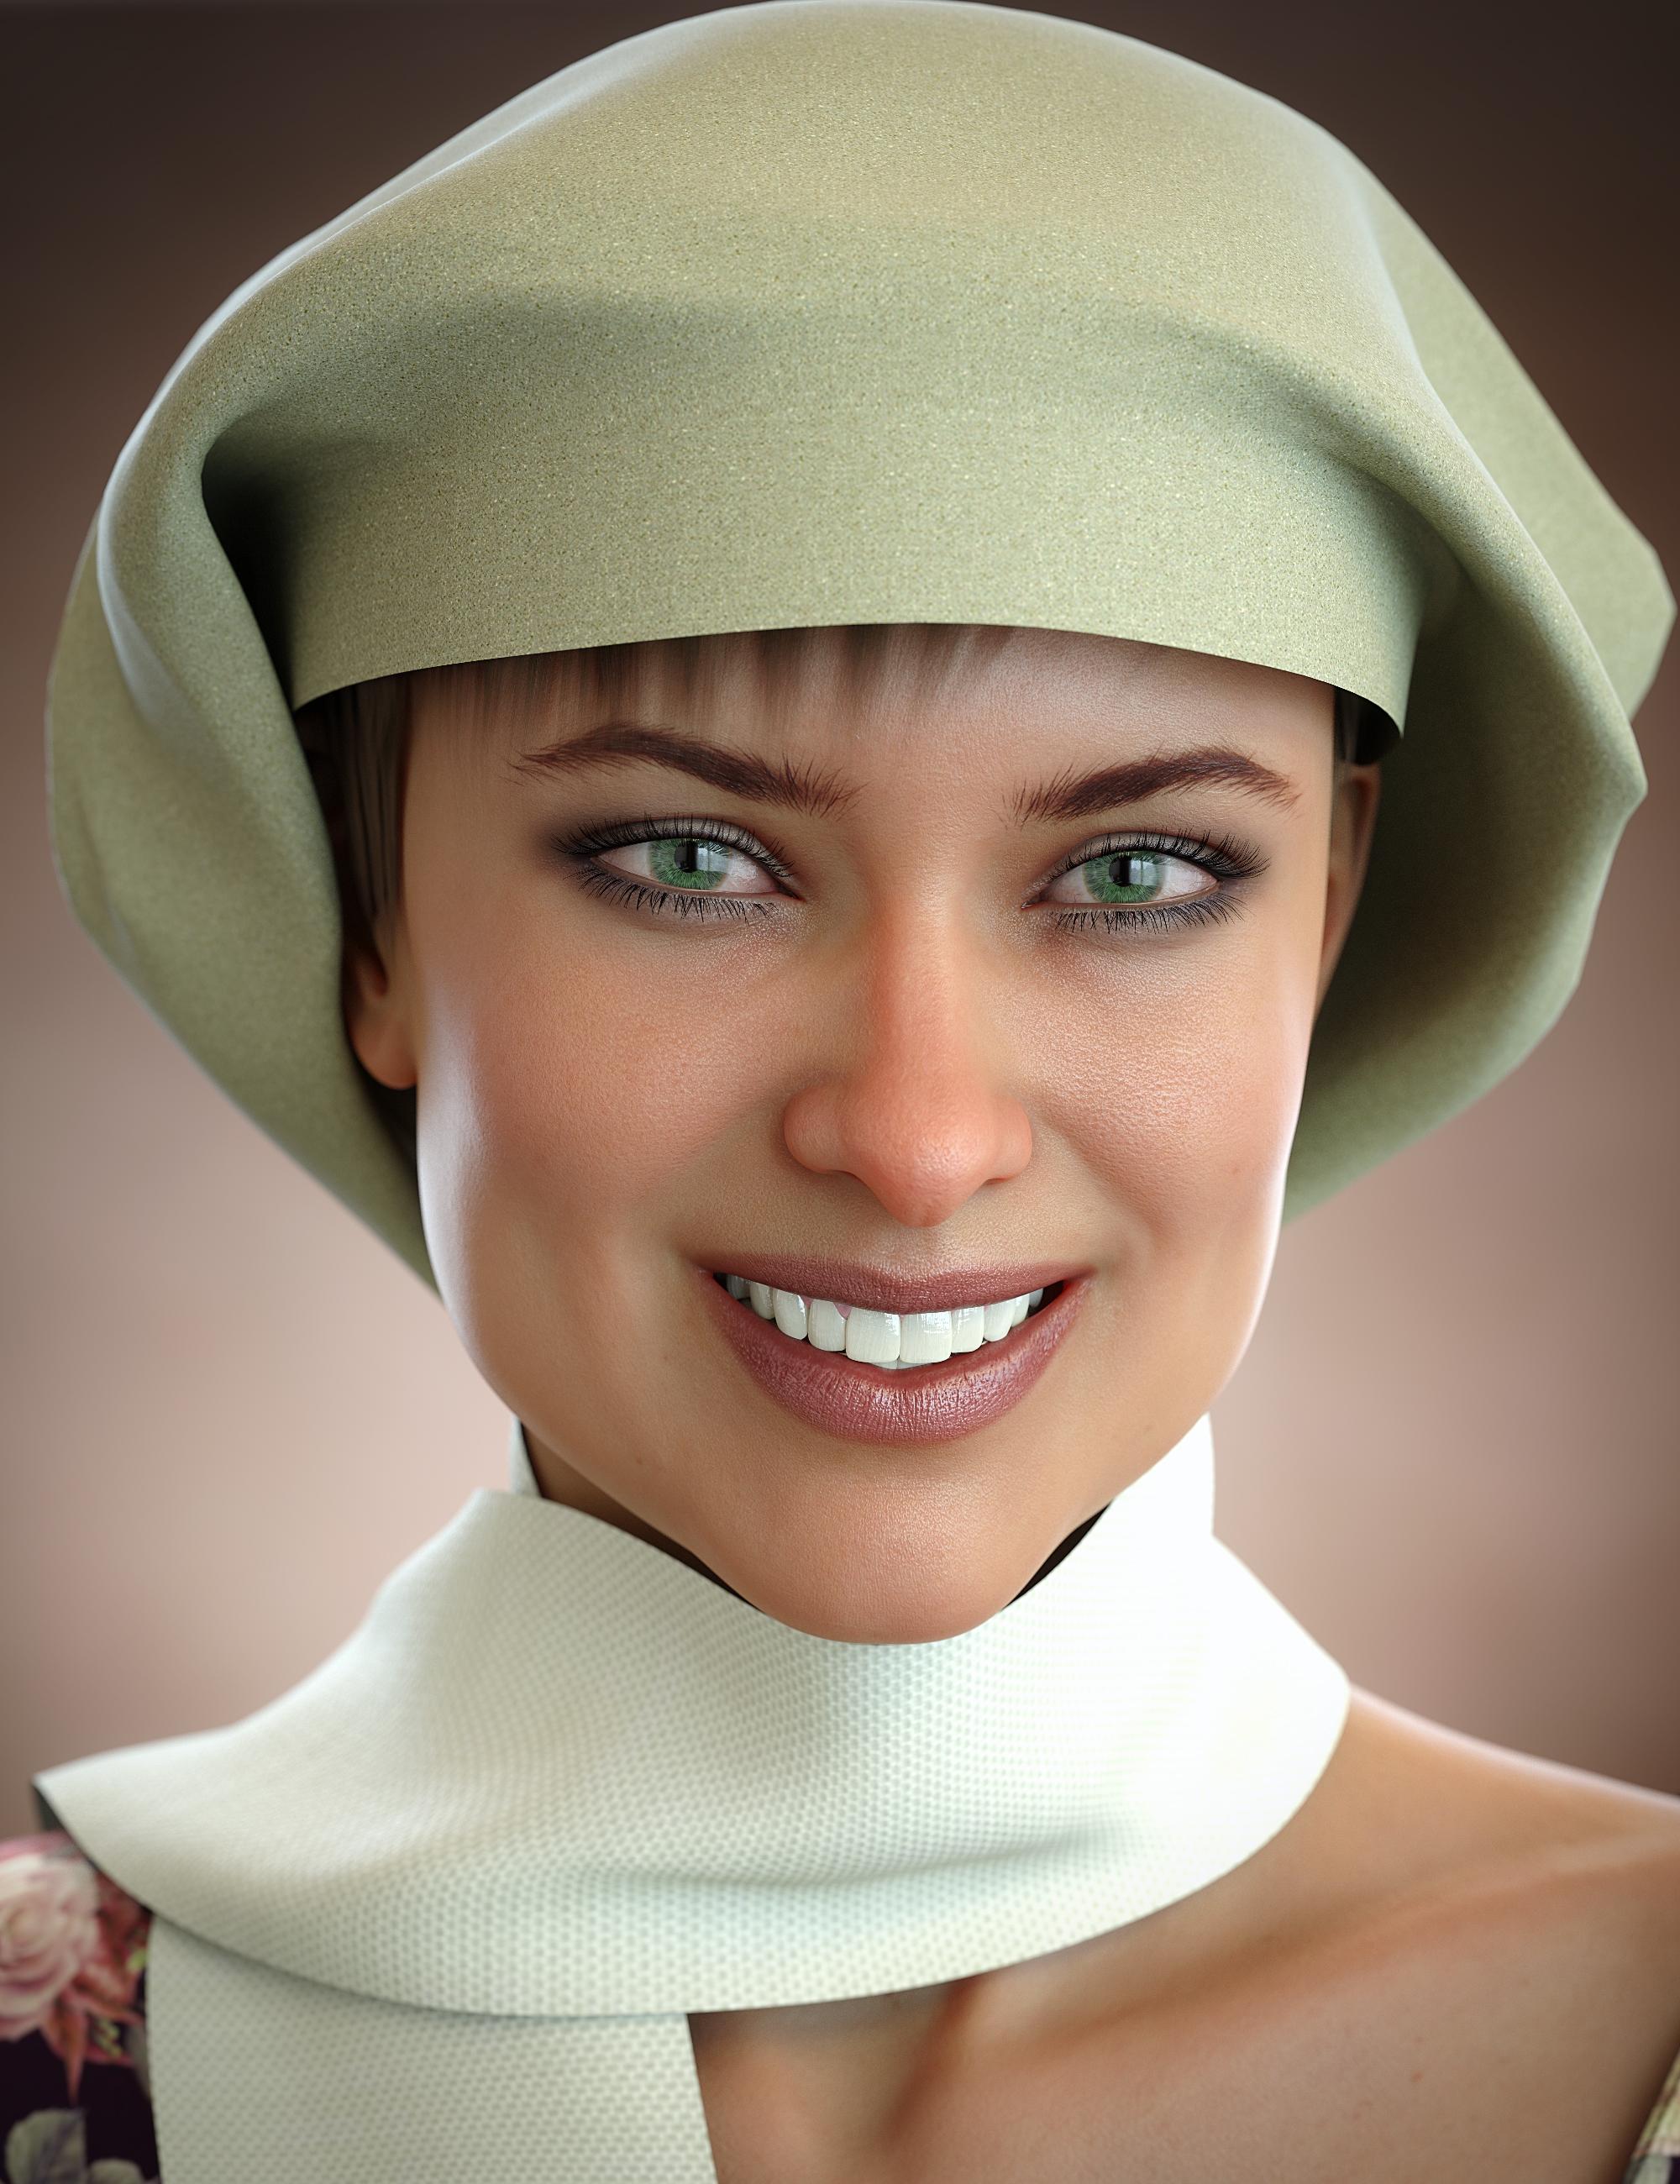 CJ 8 Starter Bundle by: , 3D Models by Daz 3D